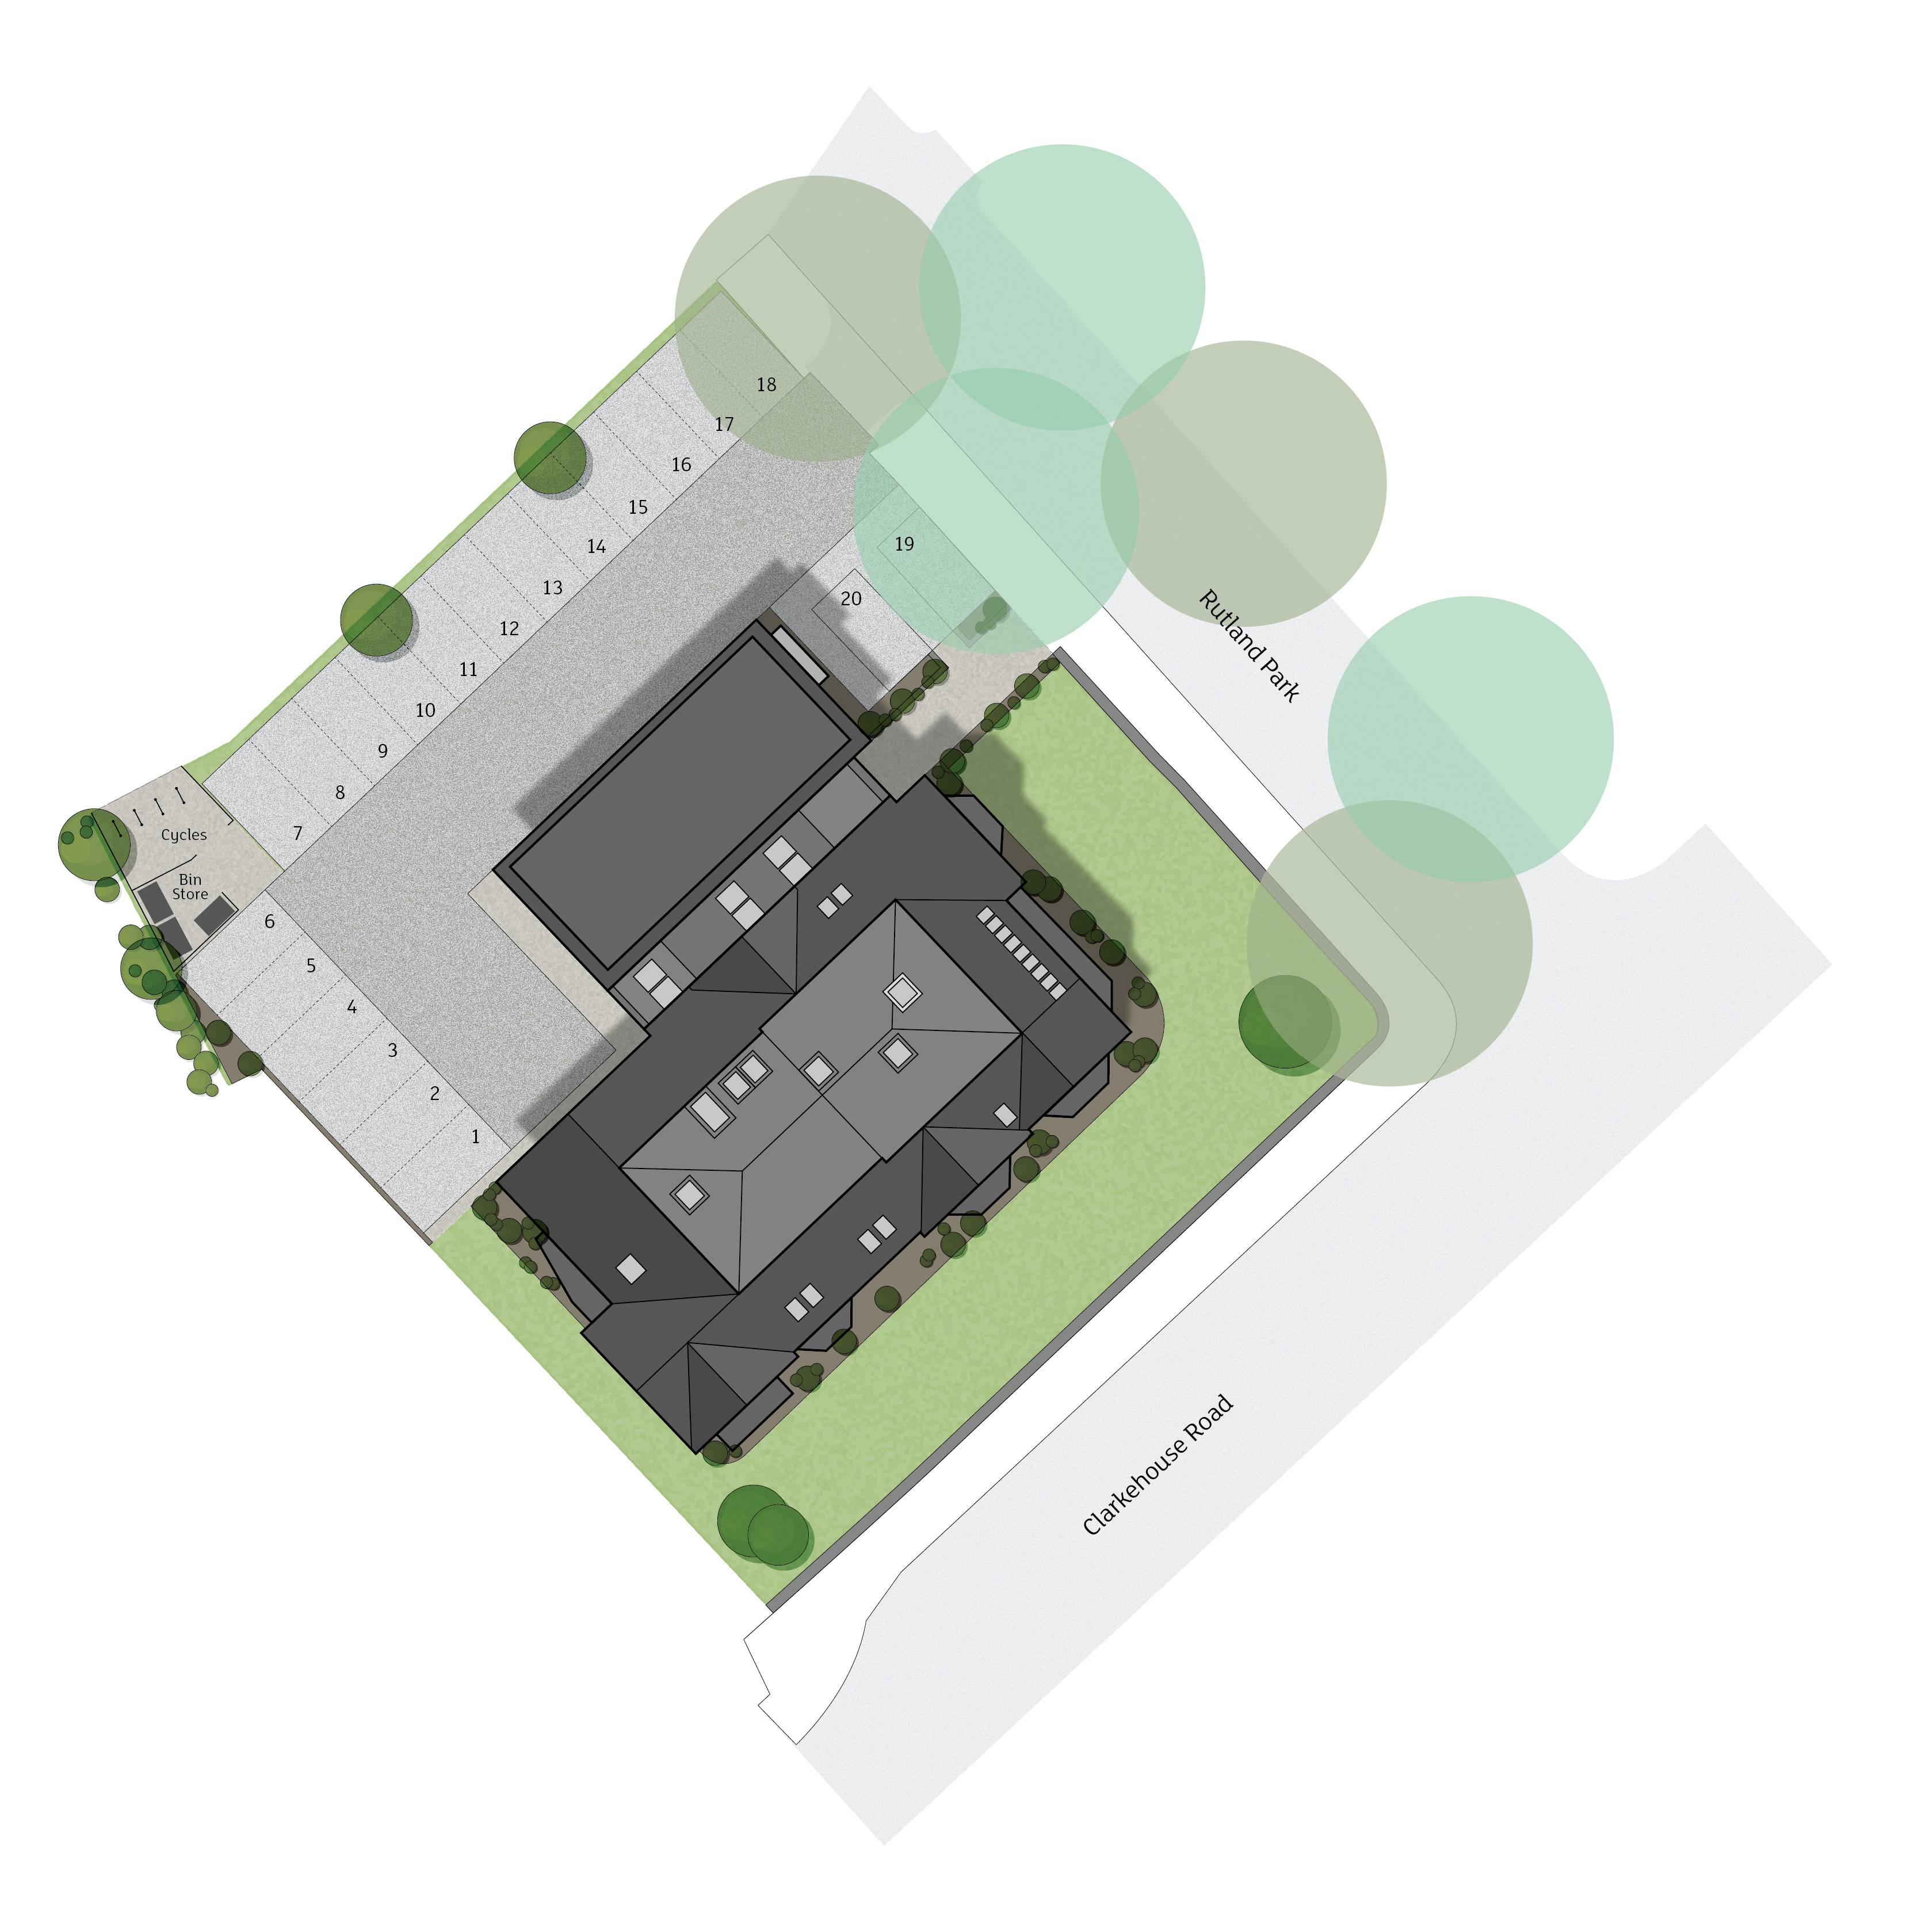 Site plan for Botanical House